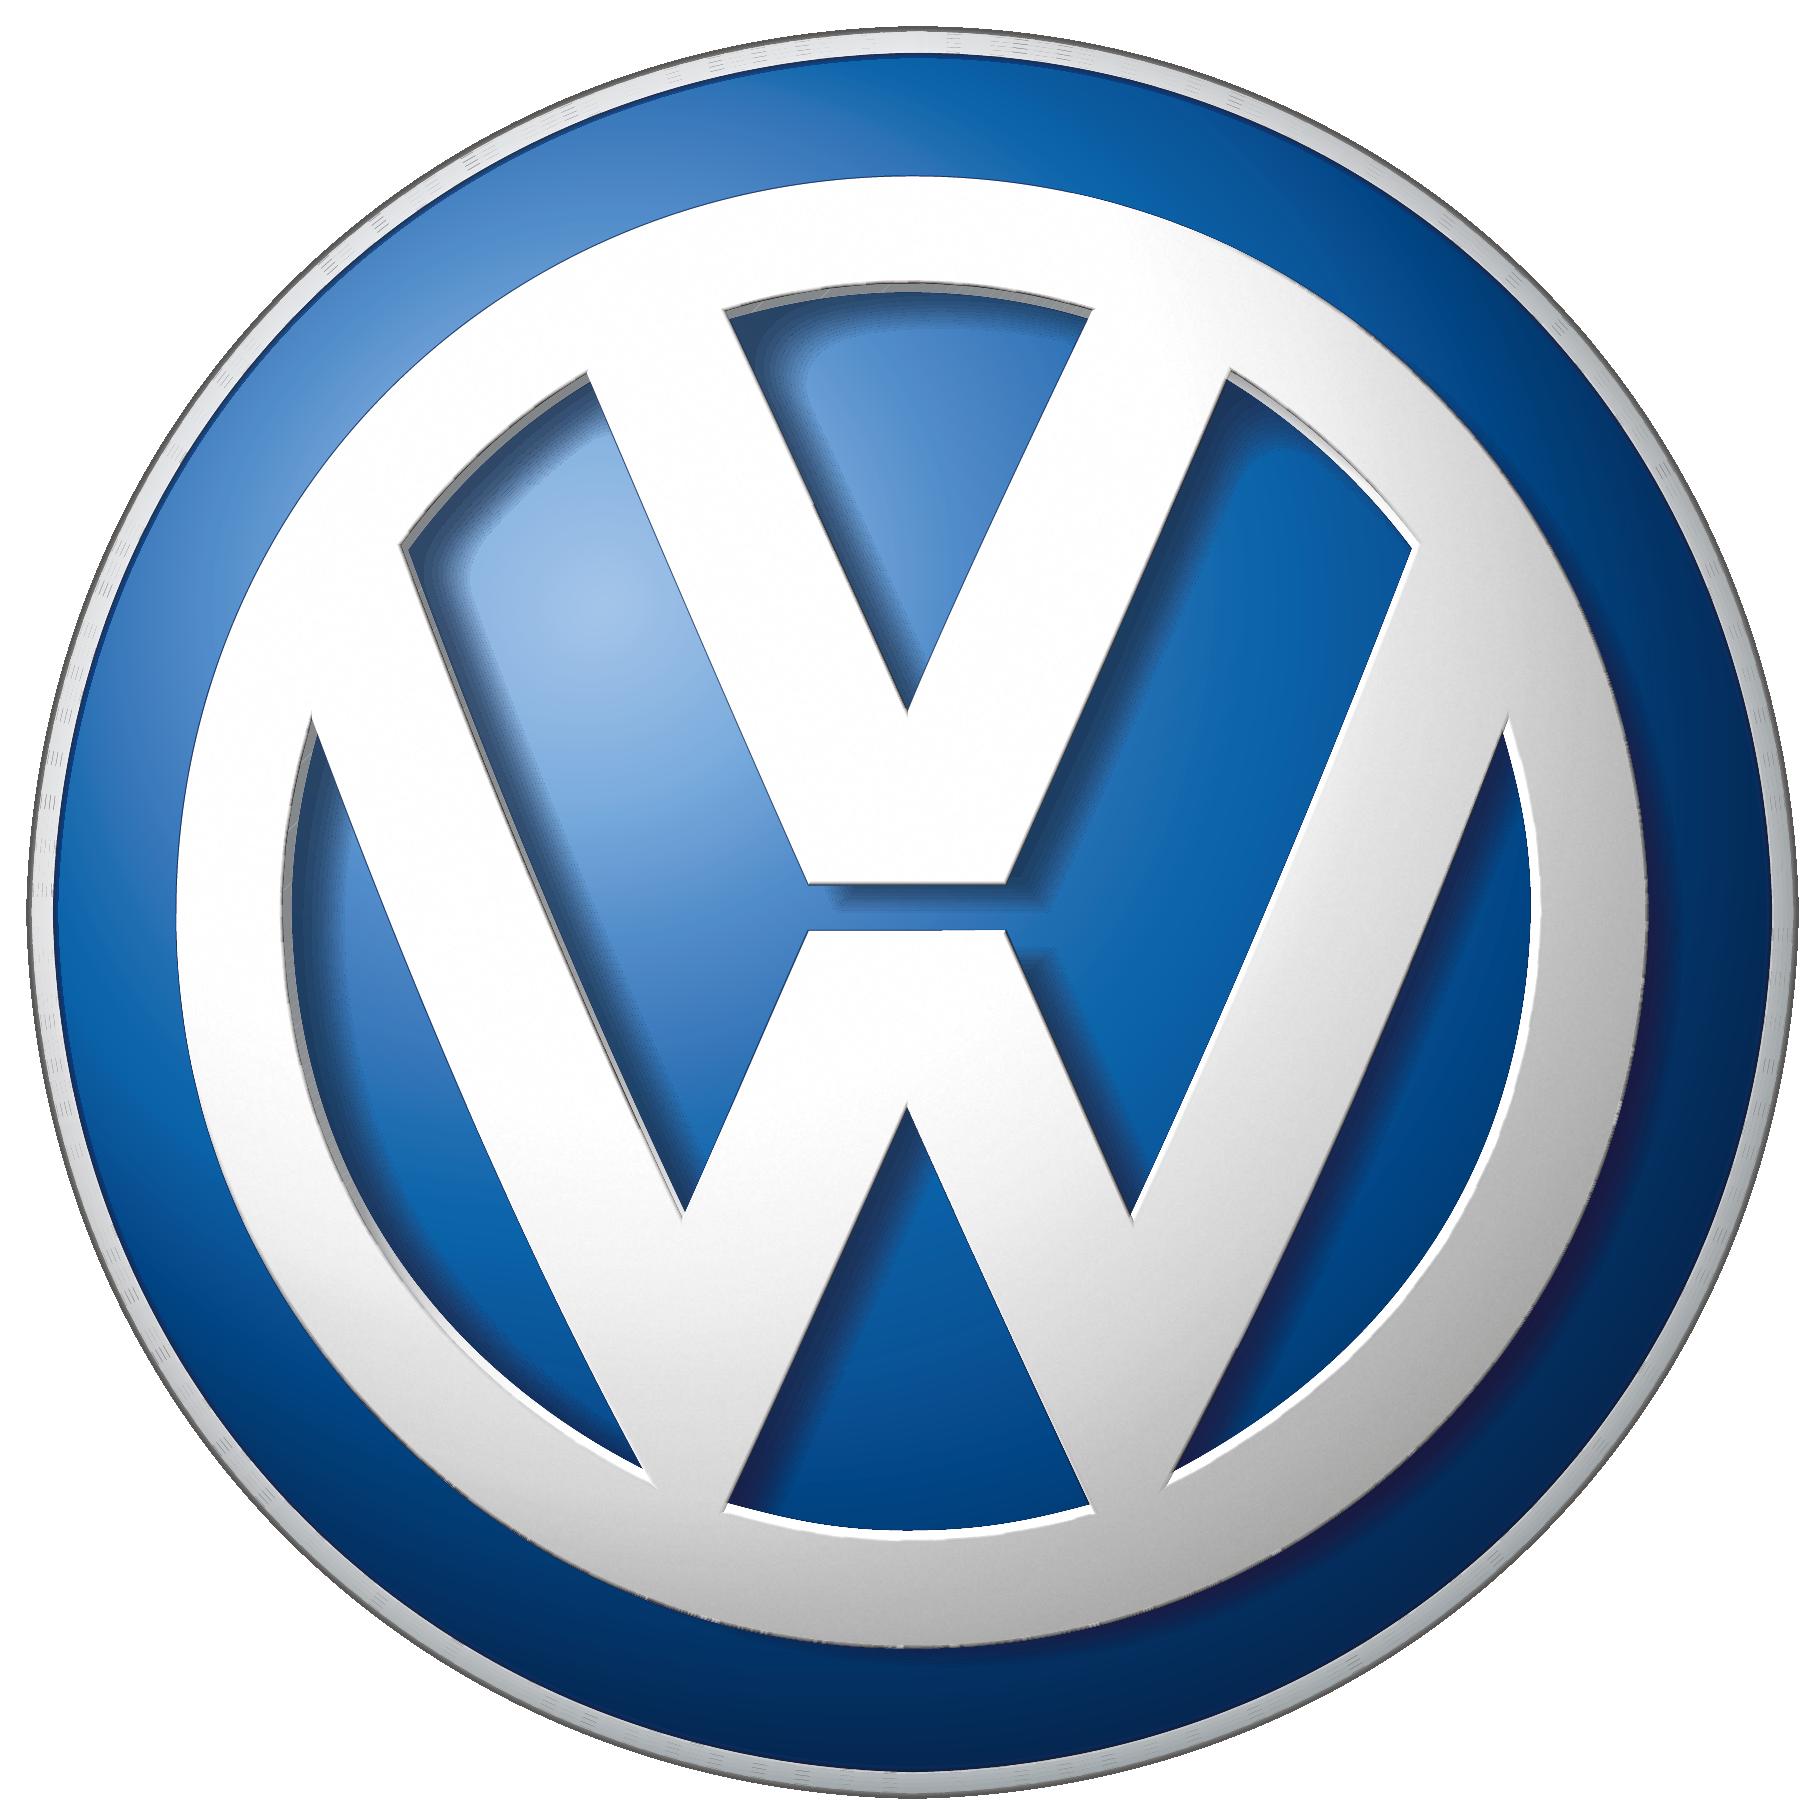 Cars logo brands PNG images.